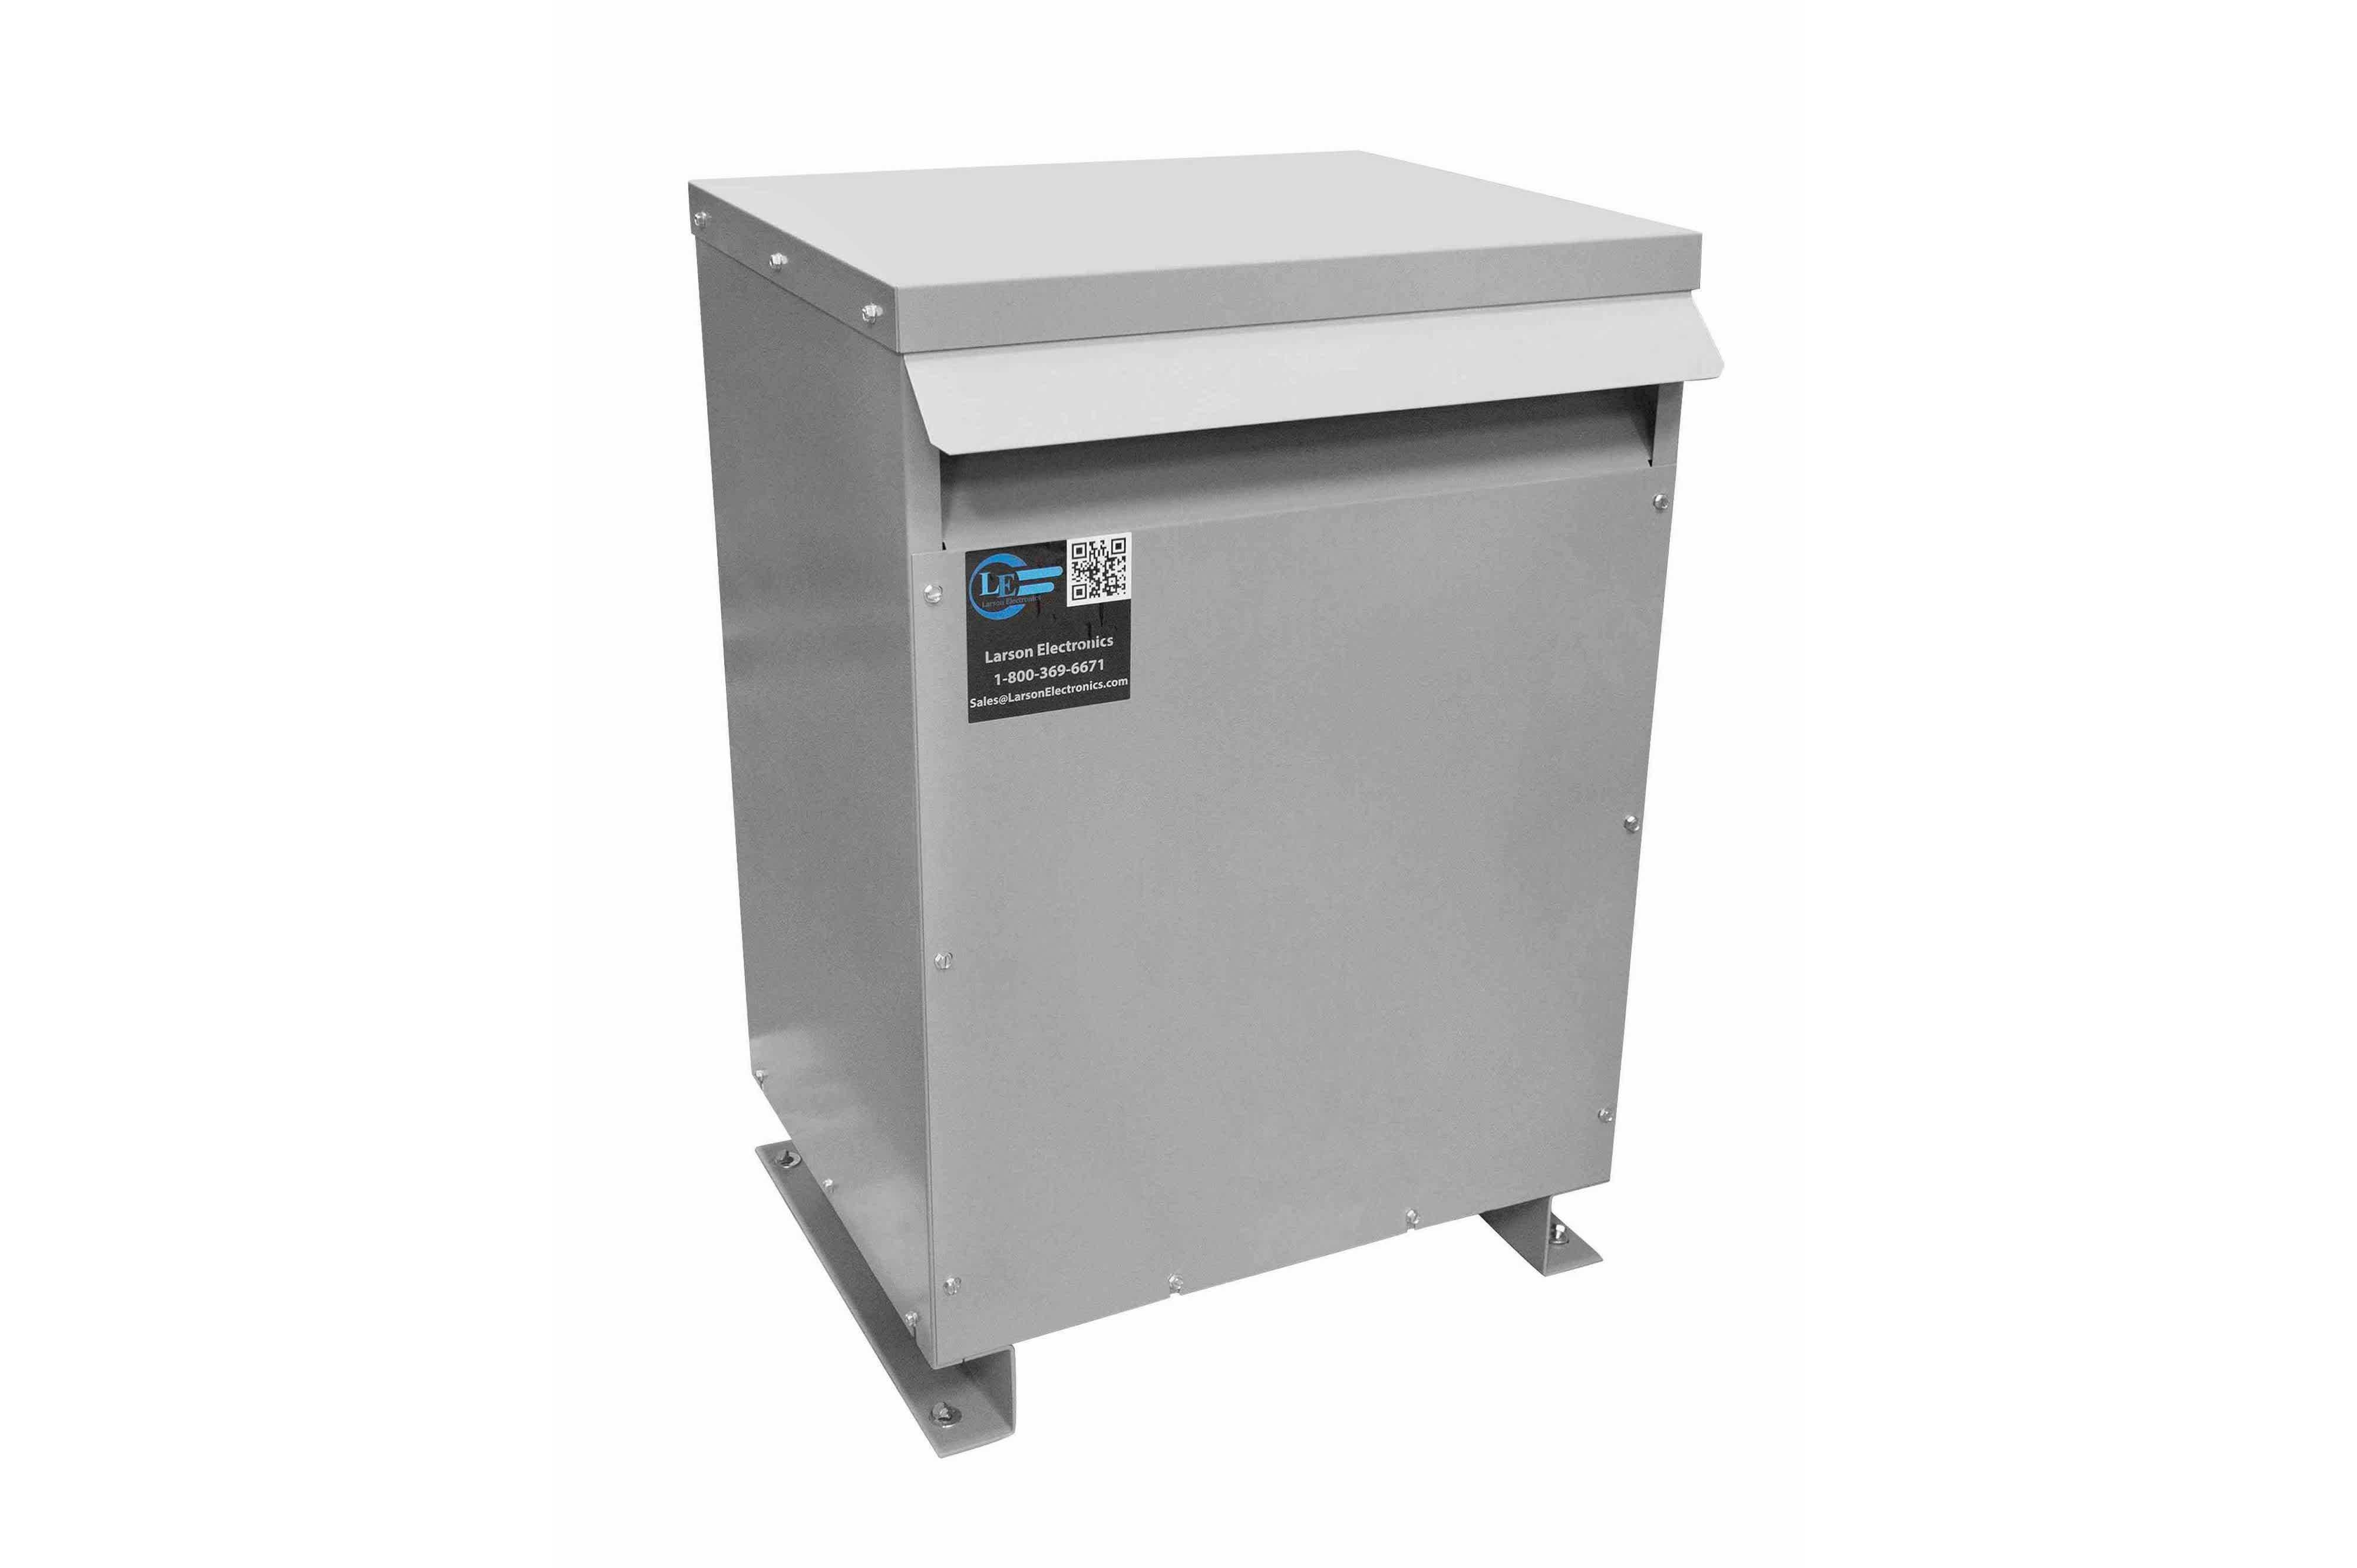 75 kVA 3PH Isolation Transformer, 440V Wye Primary, 208Y/120 Wye-N Secondary, N3R, Ventilated, 60 Hz